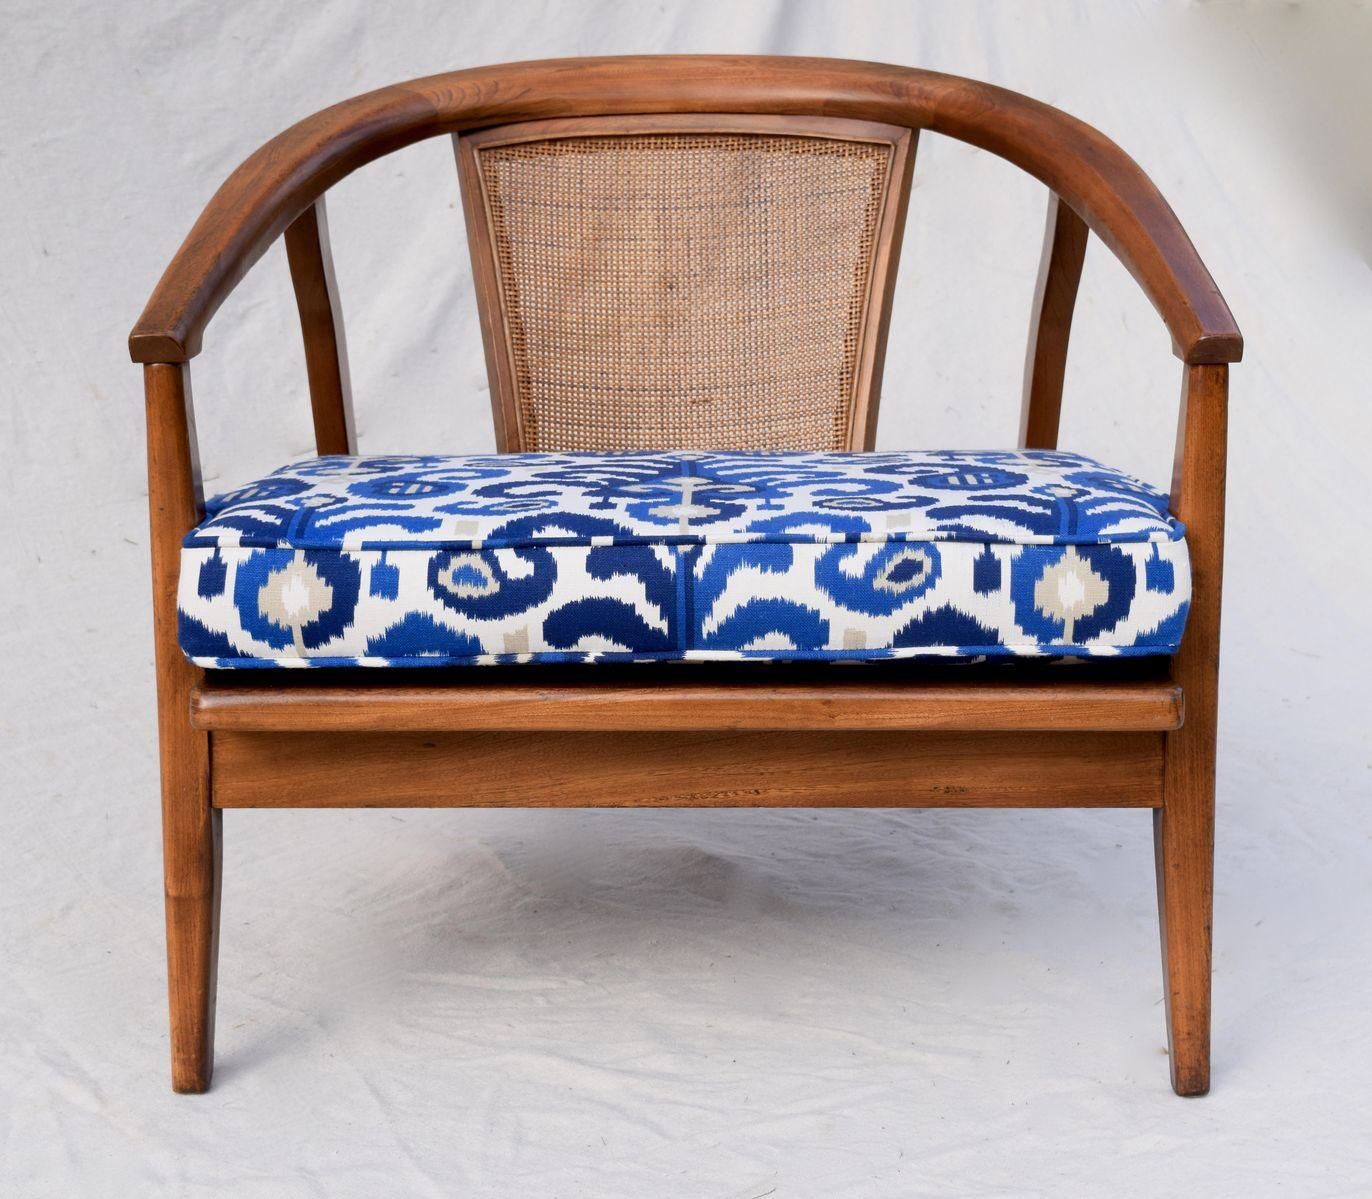 1950s Danish Modern Style Cane Back Barrel Chair On Chairish Com Chair Cane Back Chairs Barrel Chair